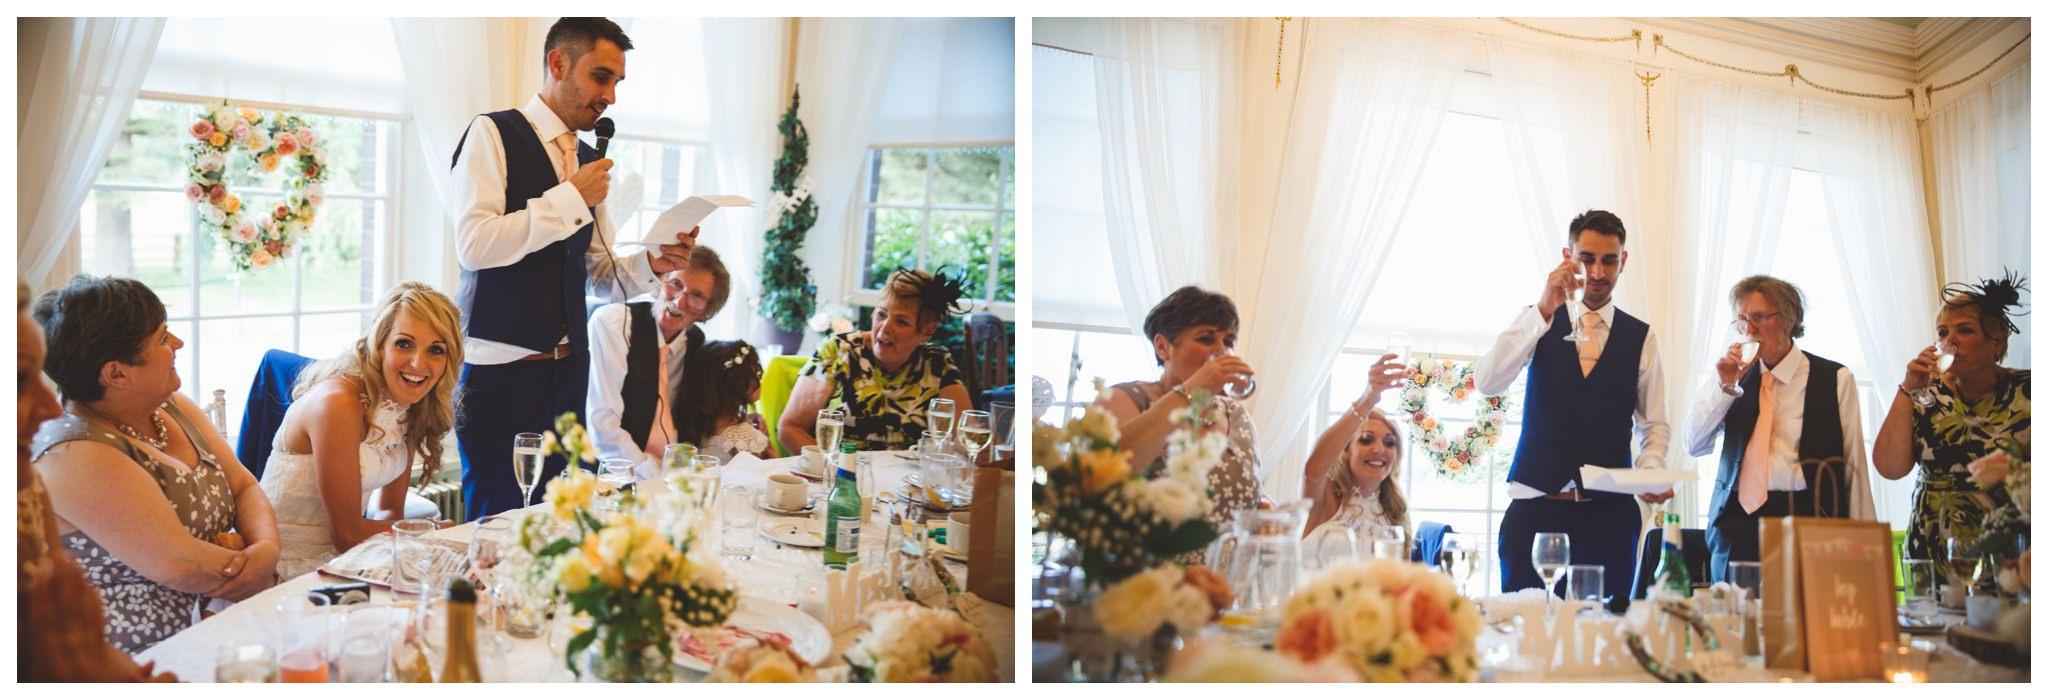 Richard Savage Photography - Wedding - Peterstone Court Brecon - 2016-05-11_0052